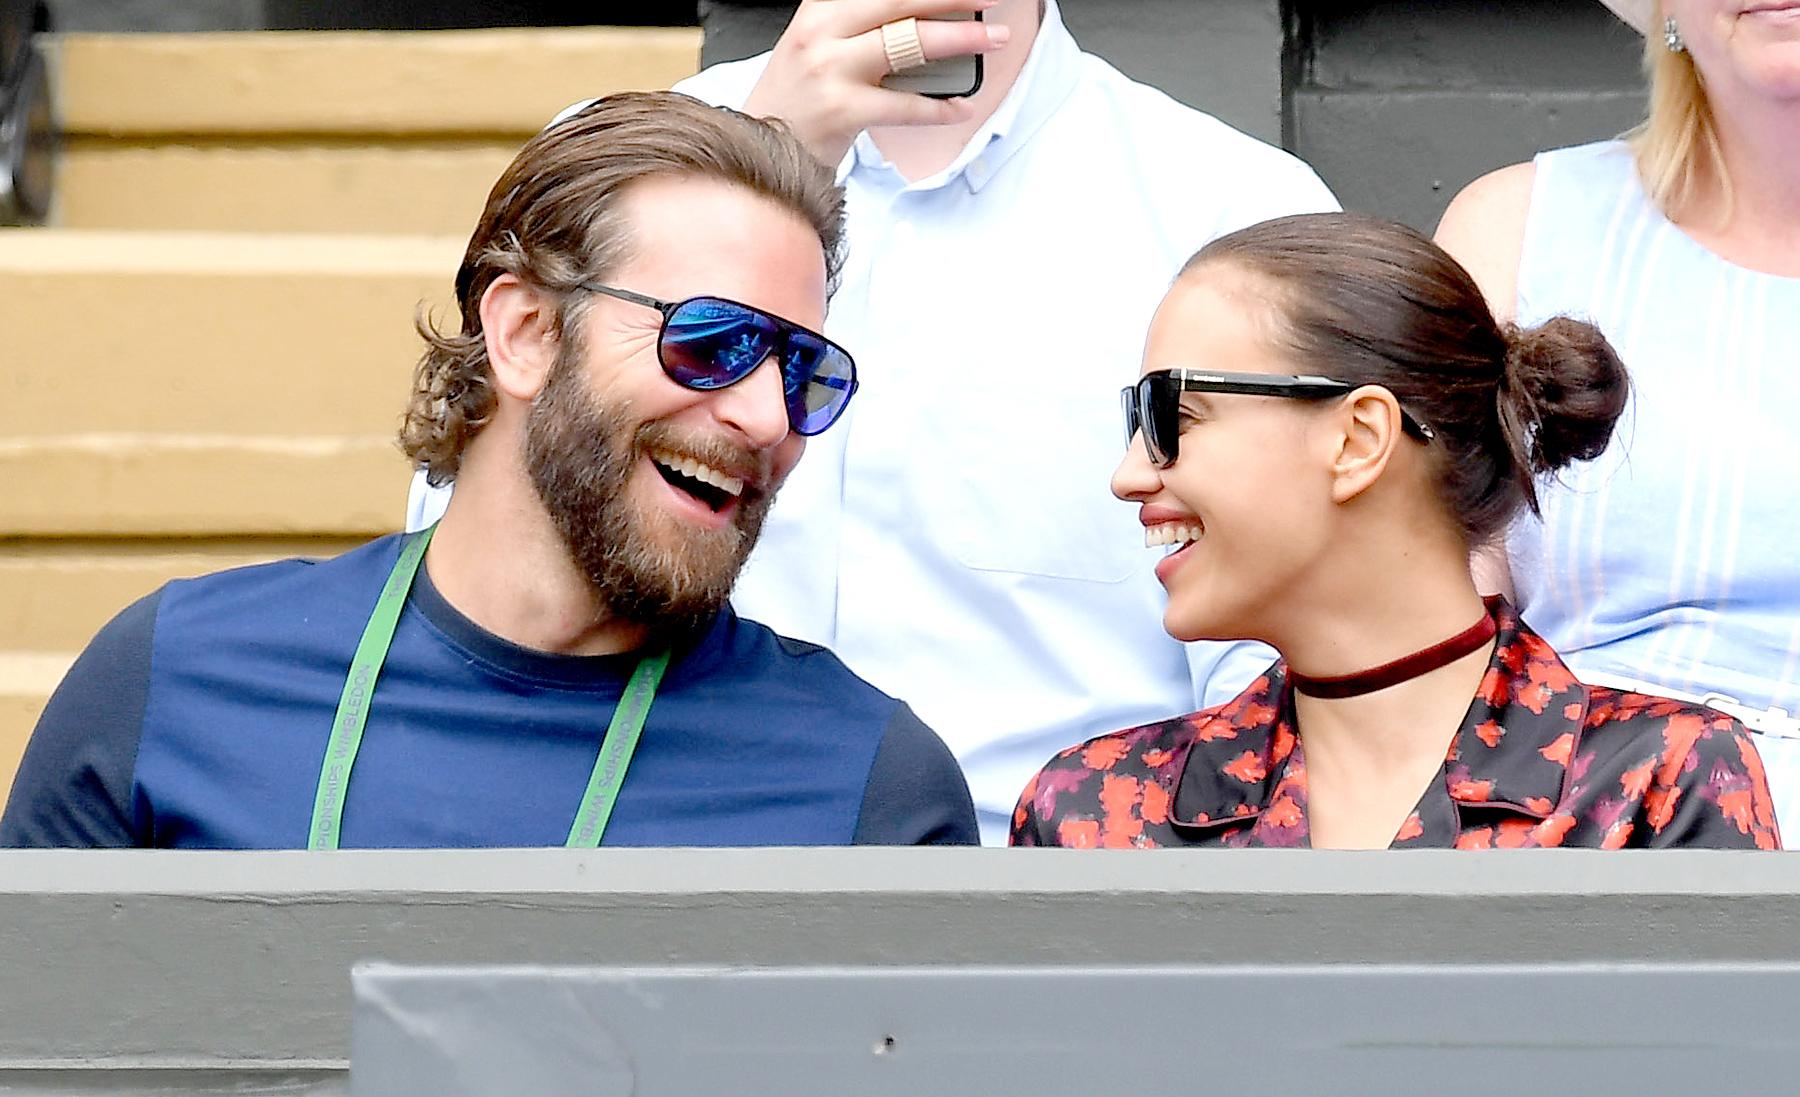 Bradley Cooper and Irina Shayk attend the Wimbledon Tennis Championships in London on July 8, 2016.